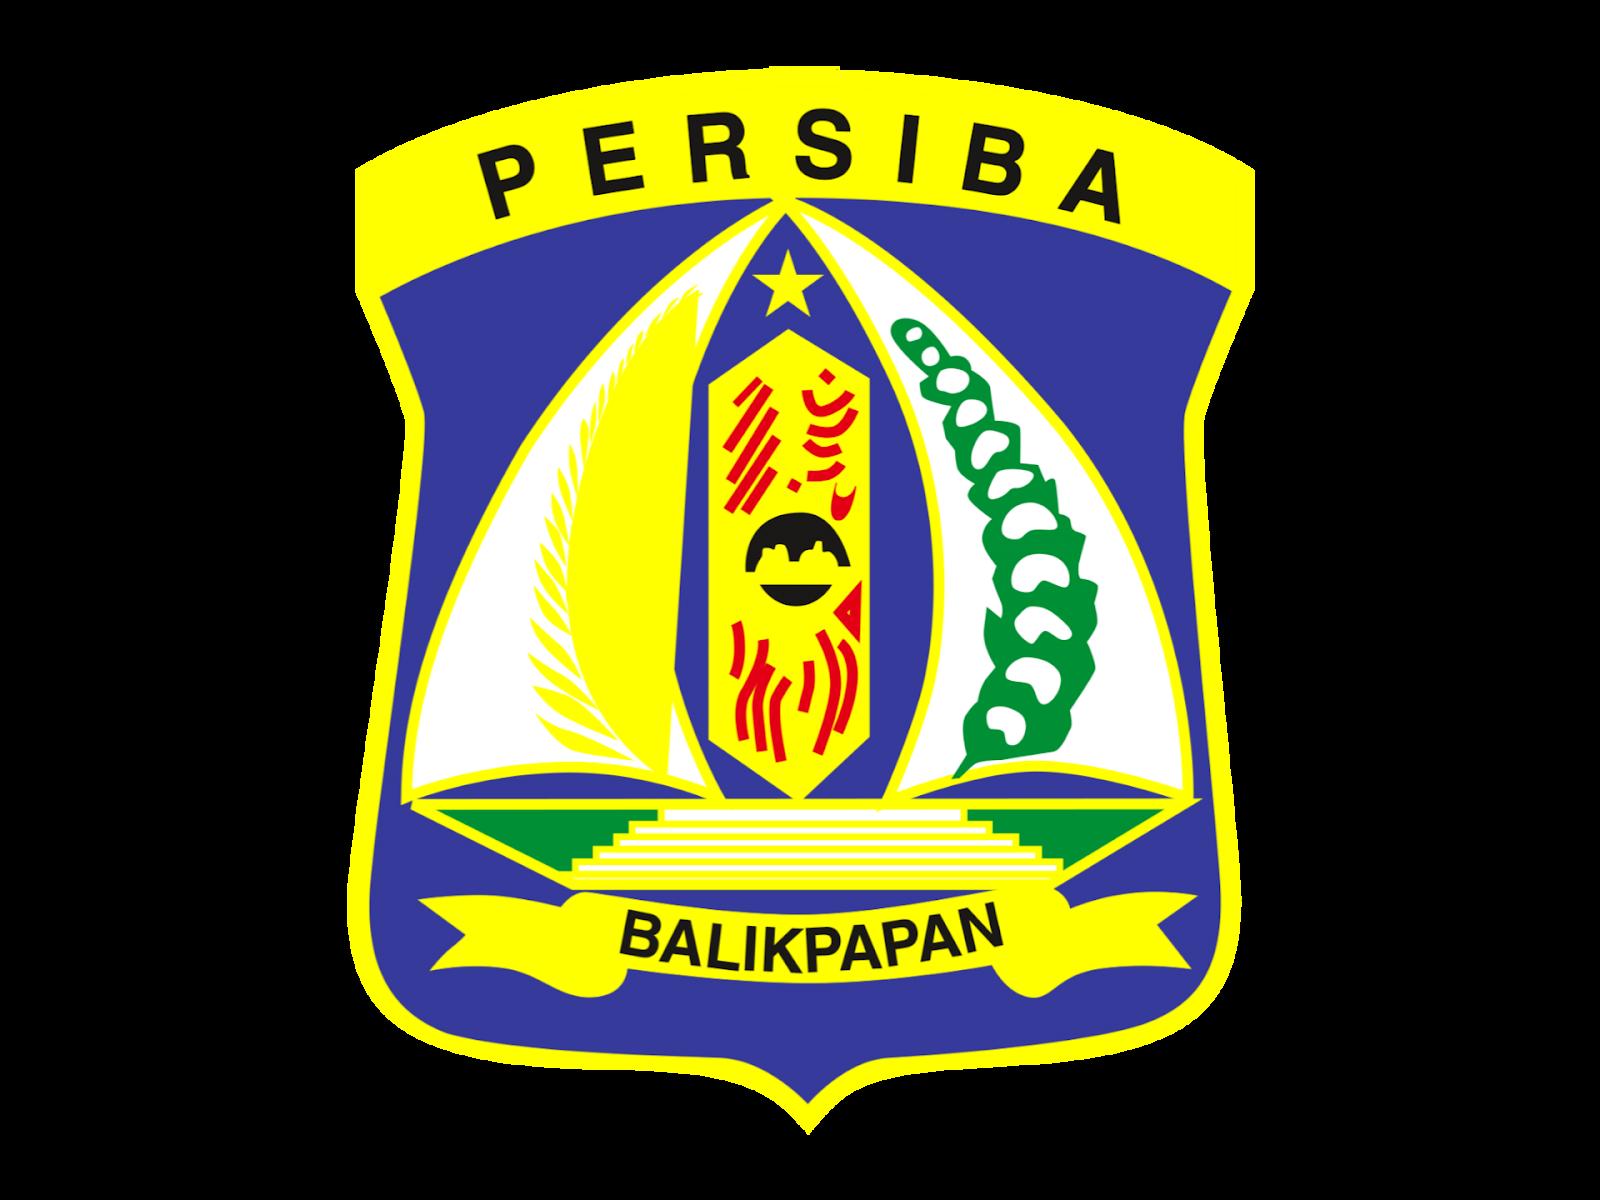 Logo Persiba Balikpapan Format PNG